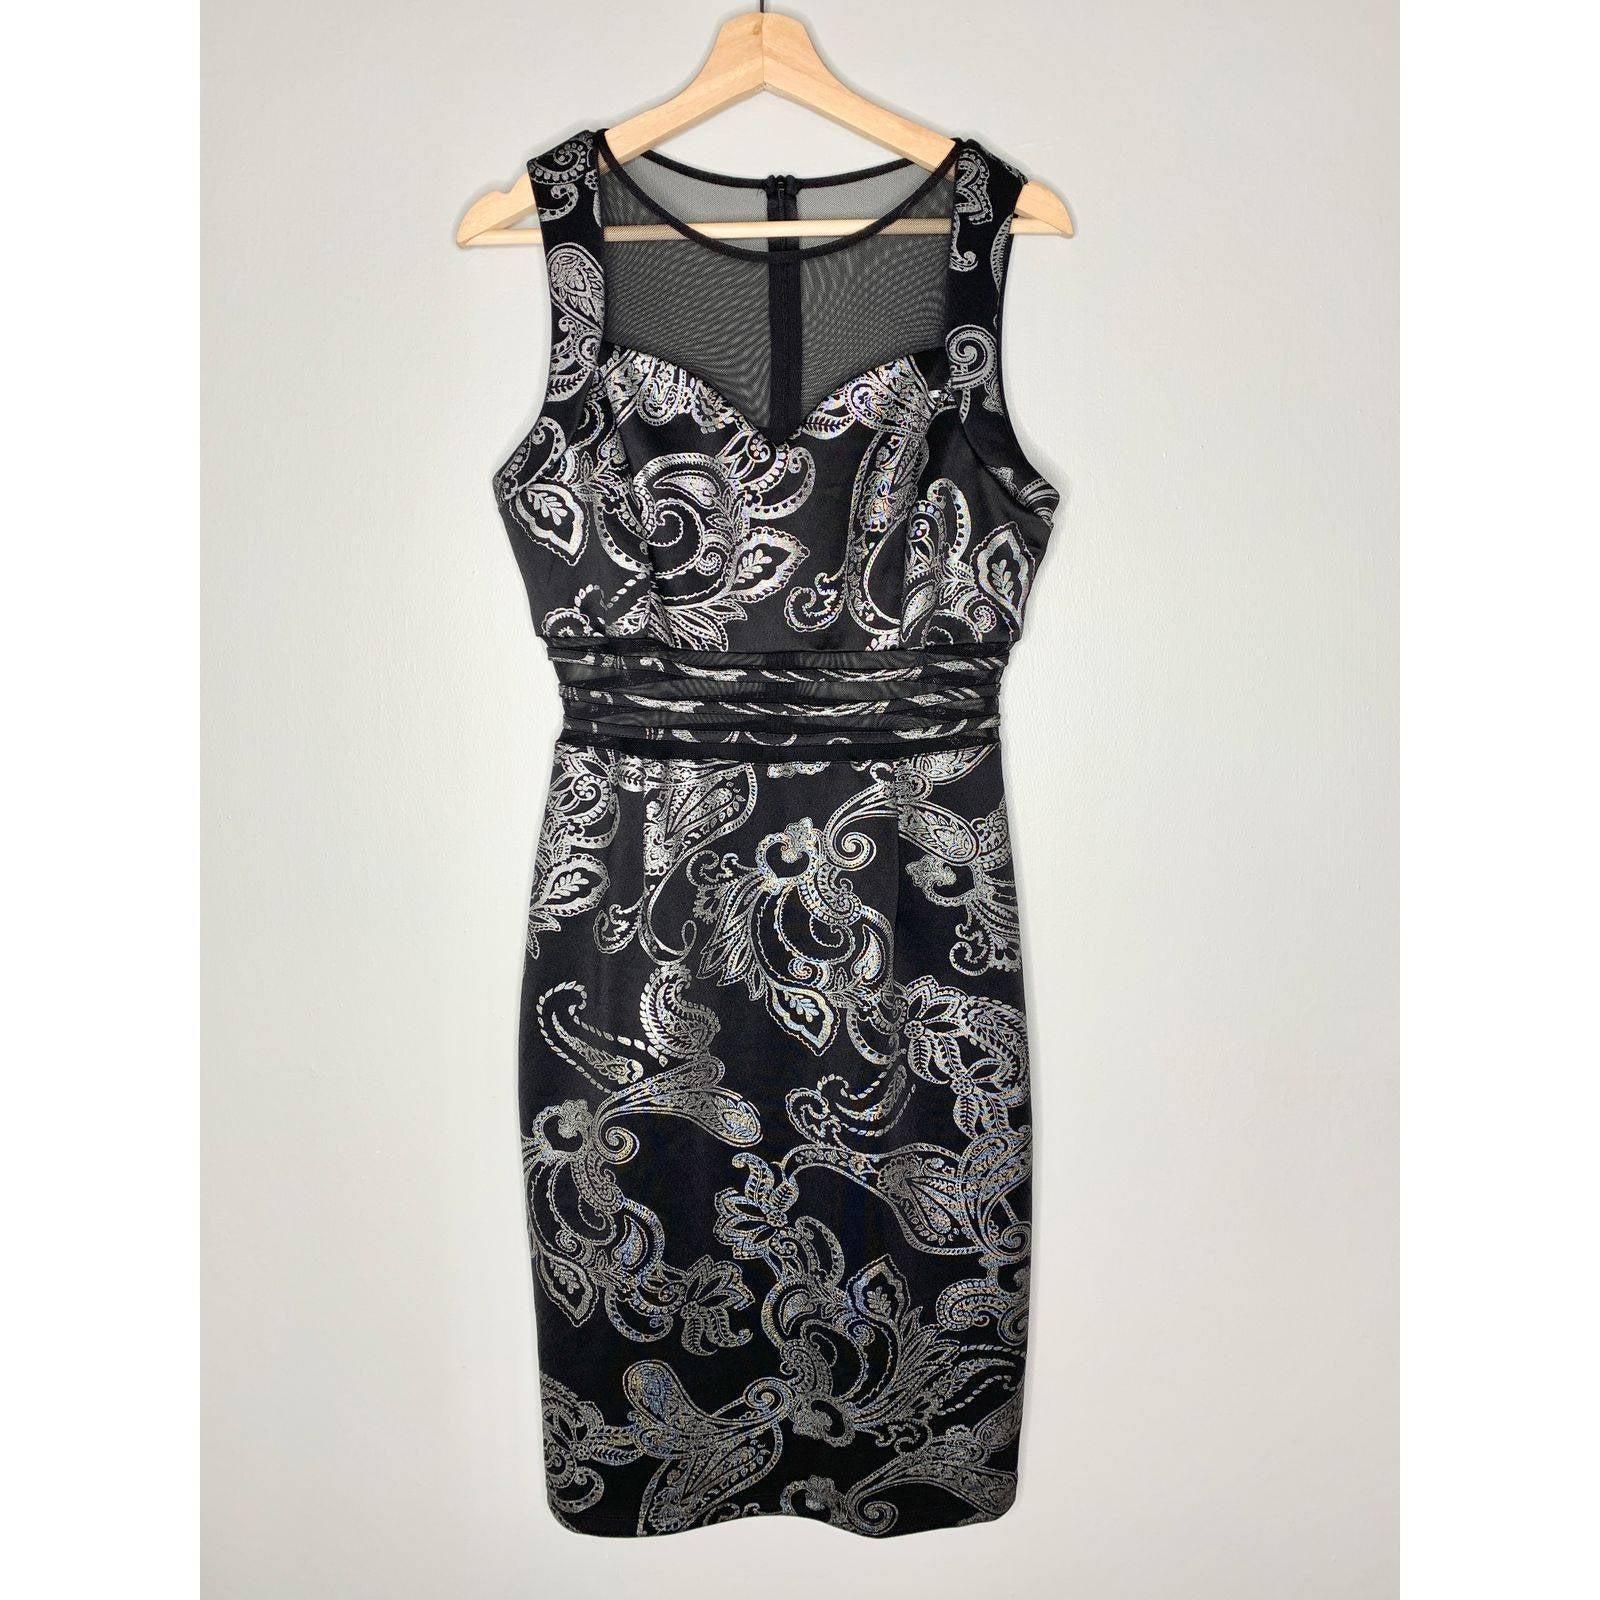 Enfocus Studio Black Silver Midi Dress 6